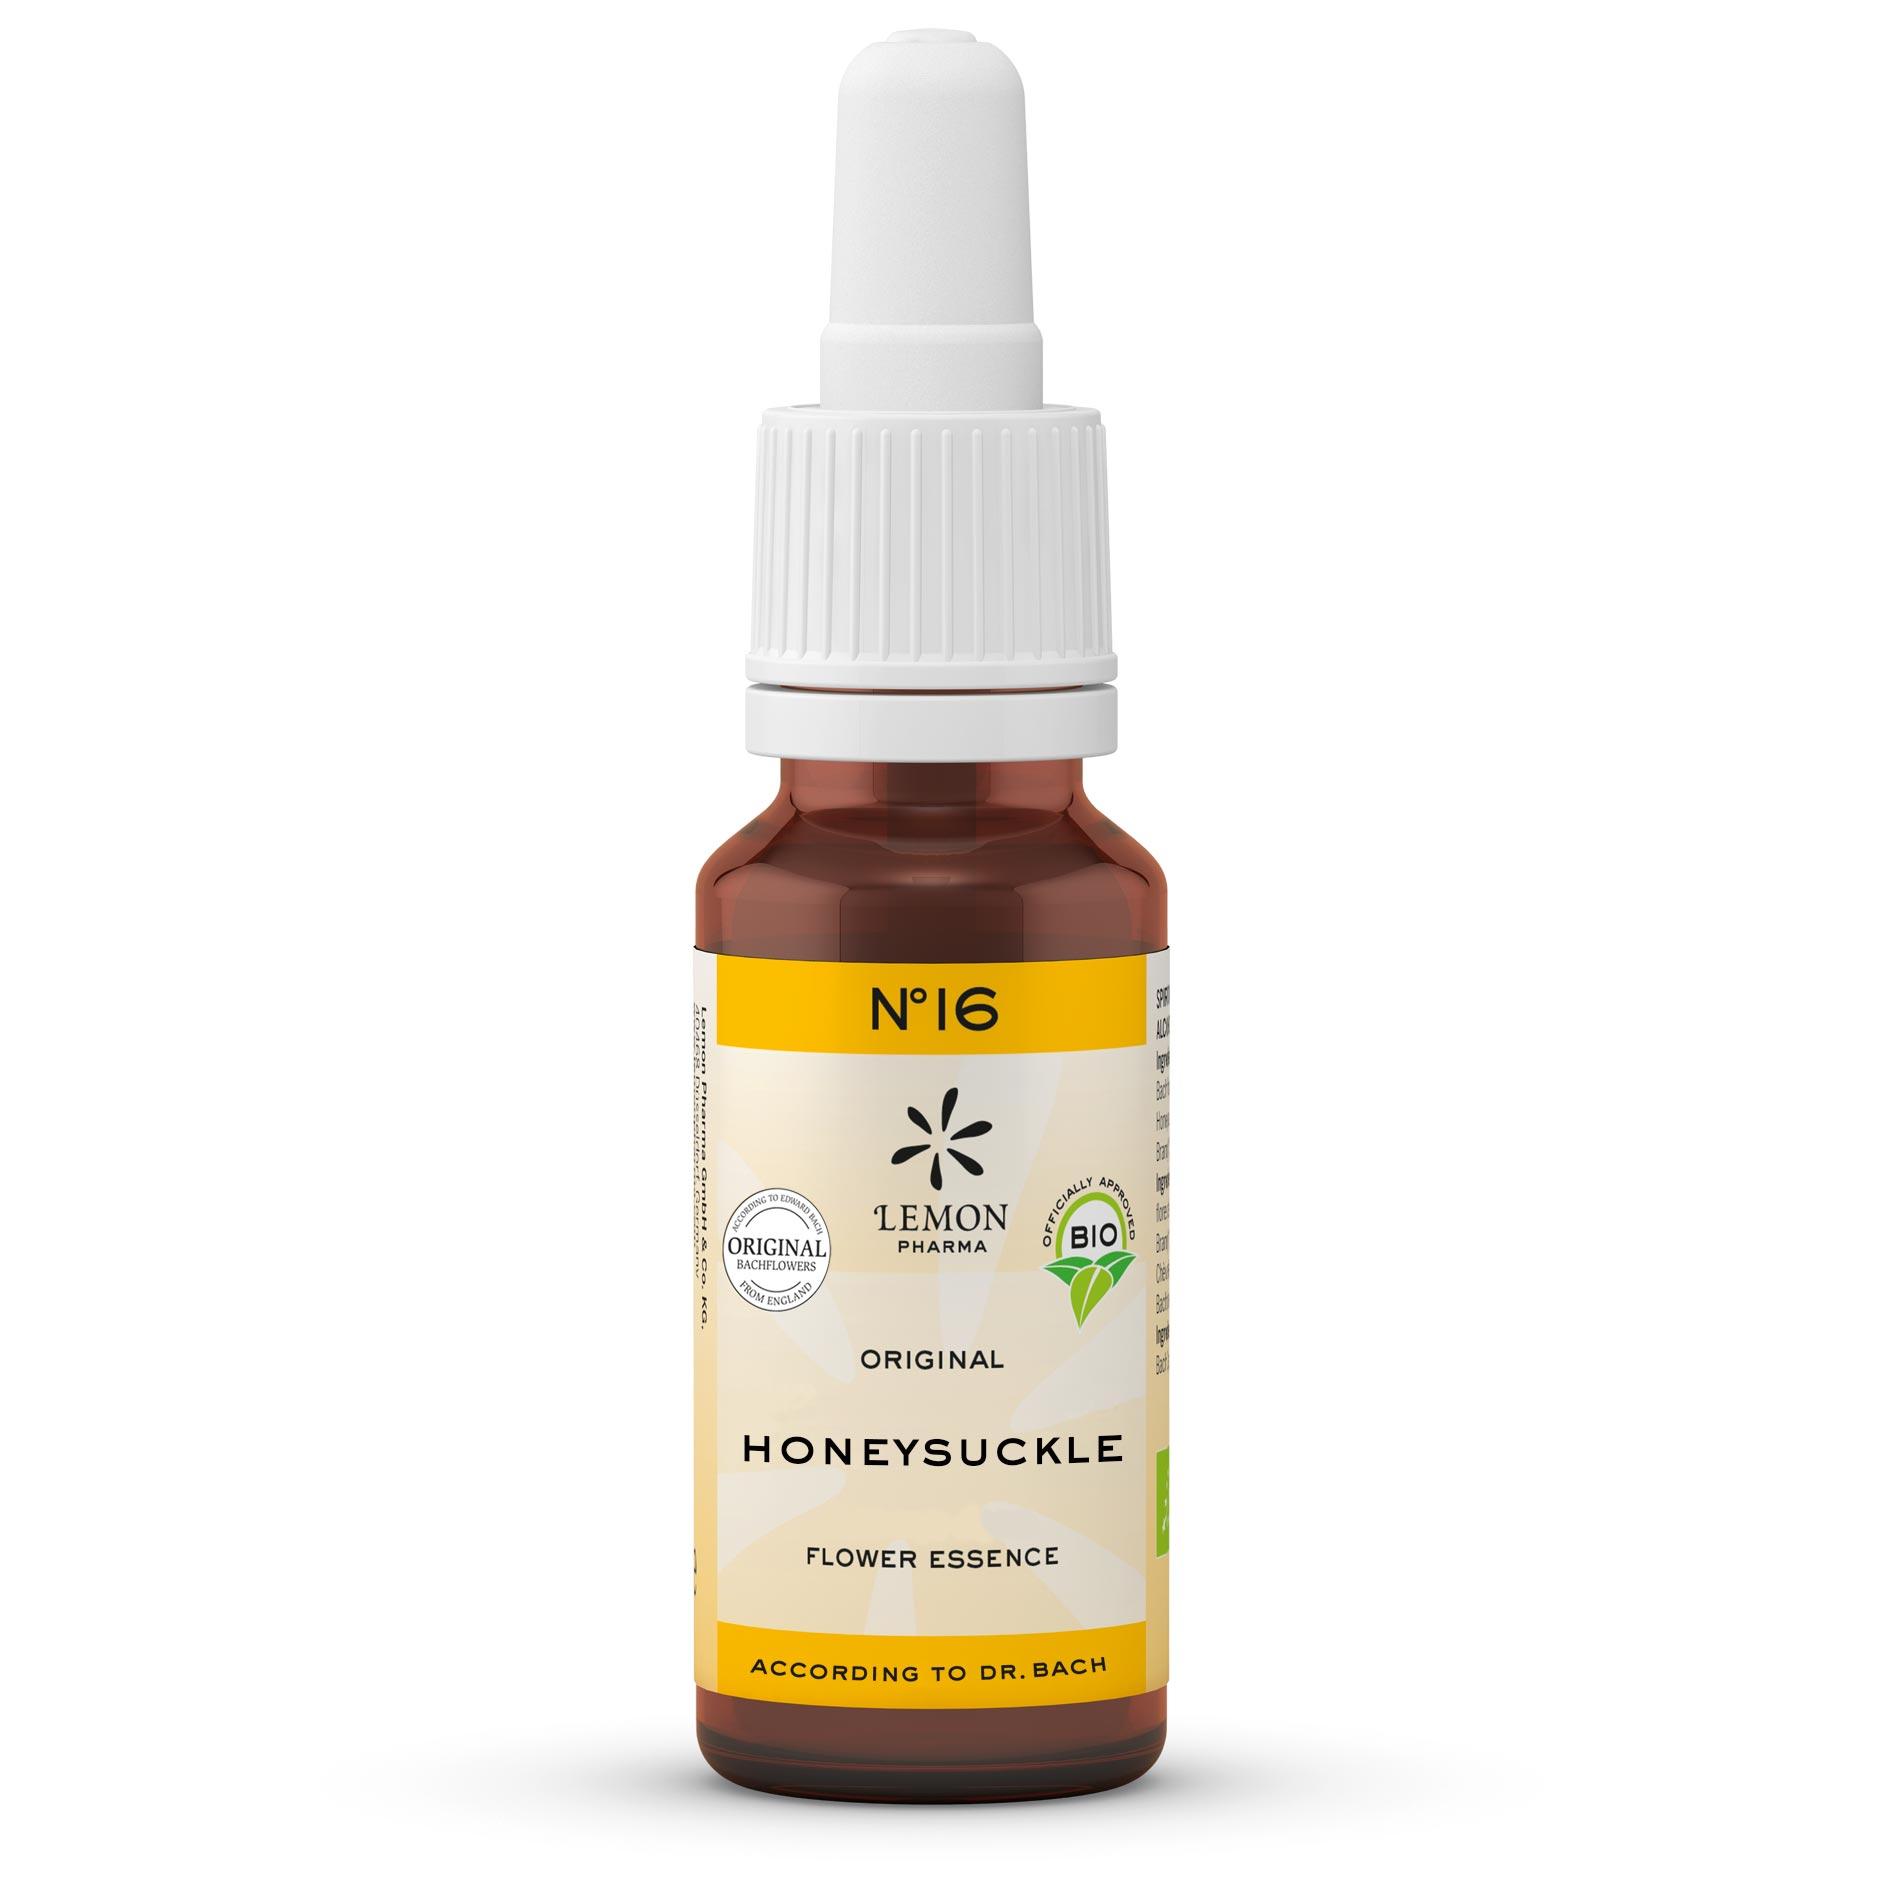 Fiori di Bach originali Lemon Pharma No 16 Honeysuckle caprifoglio presente